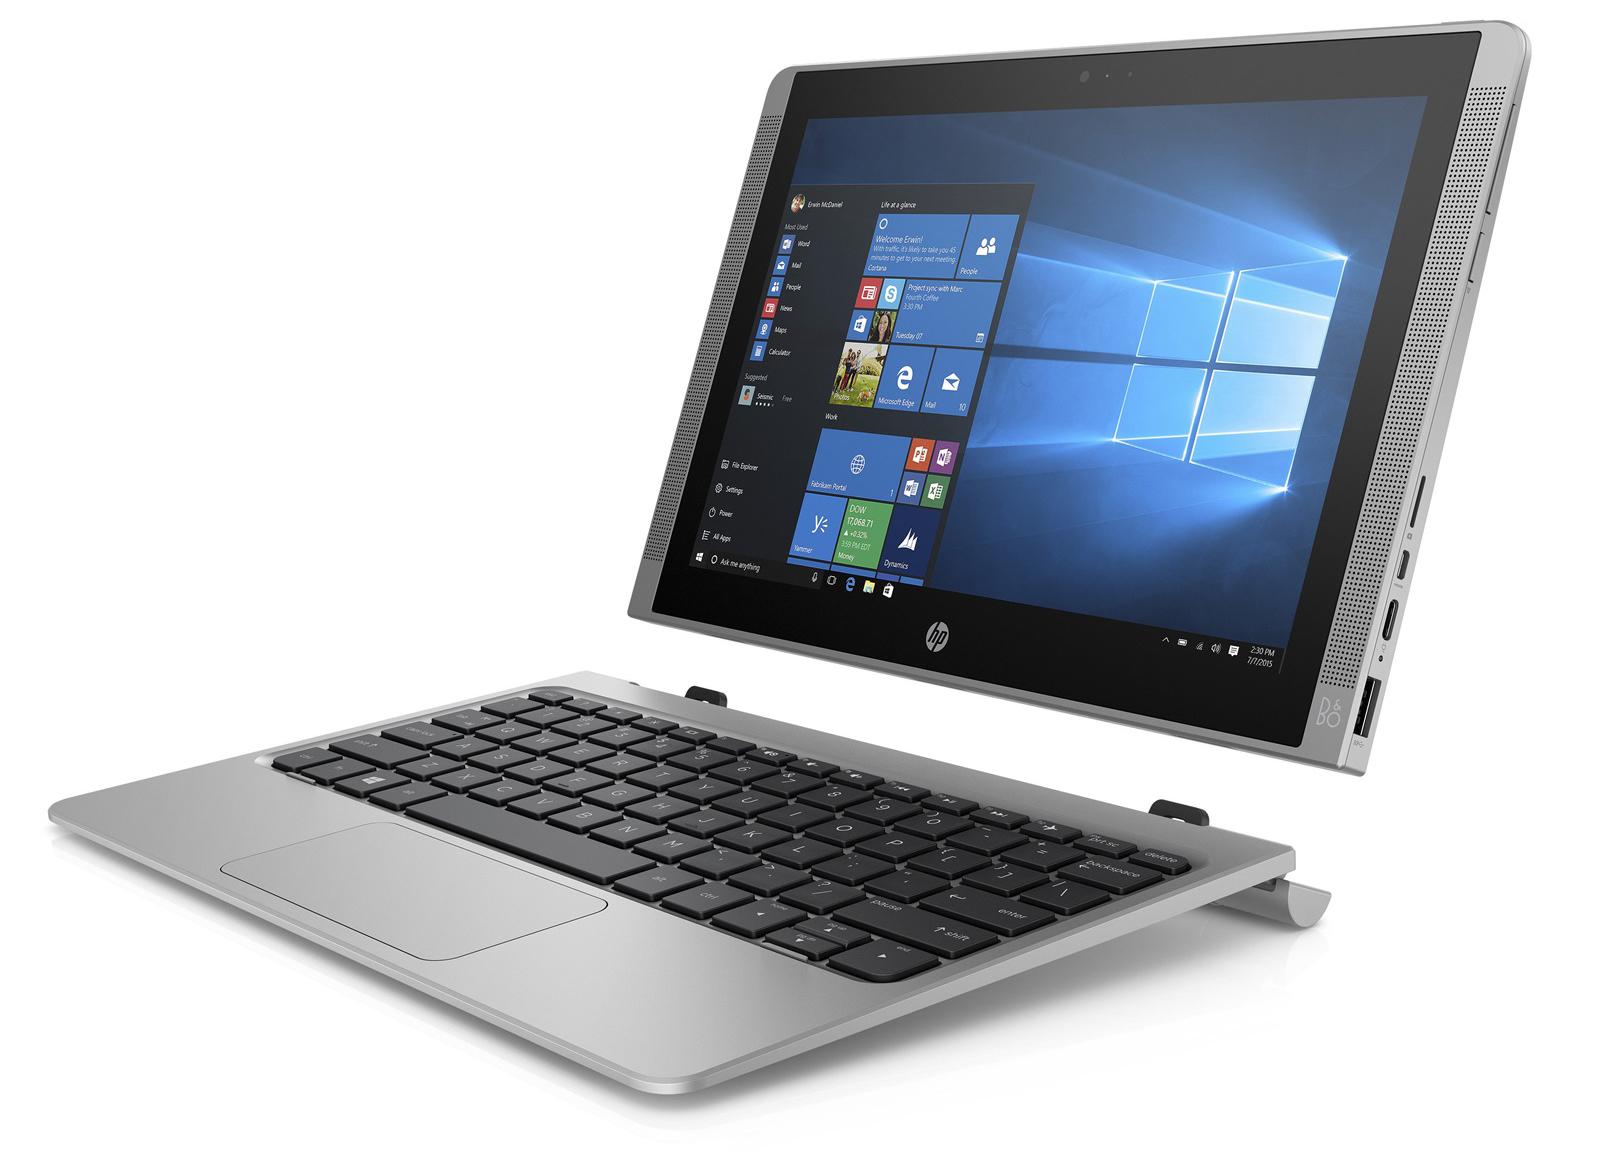 Hp x2 210 windows 10 laptop tablet 100 retrobike for Notebook tablet